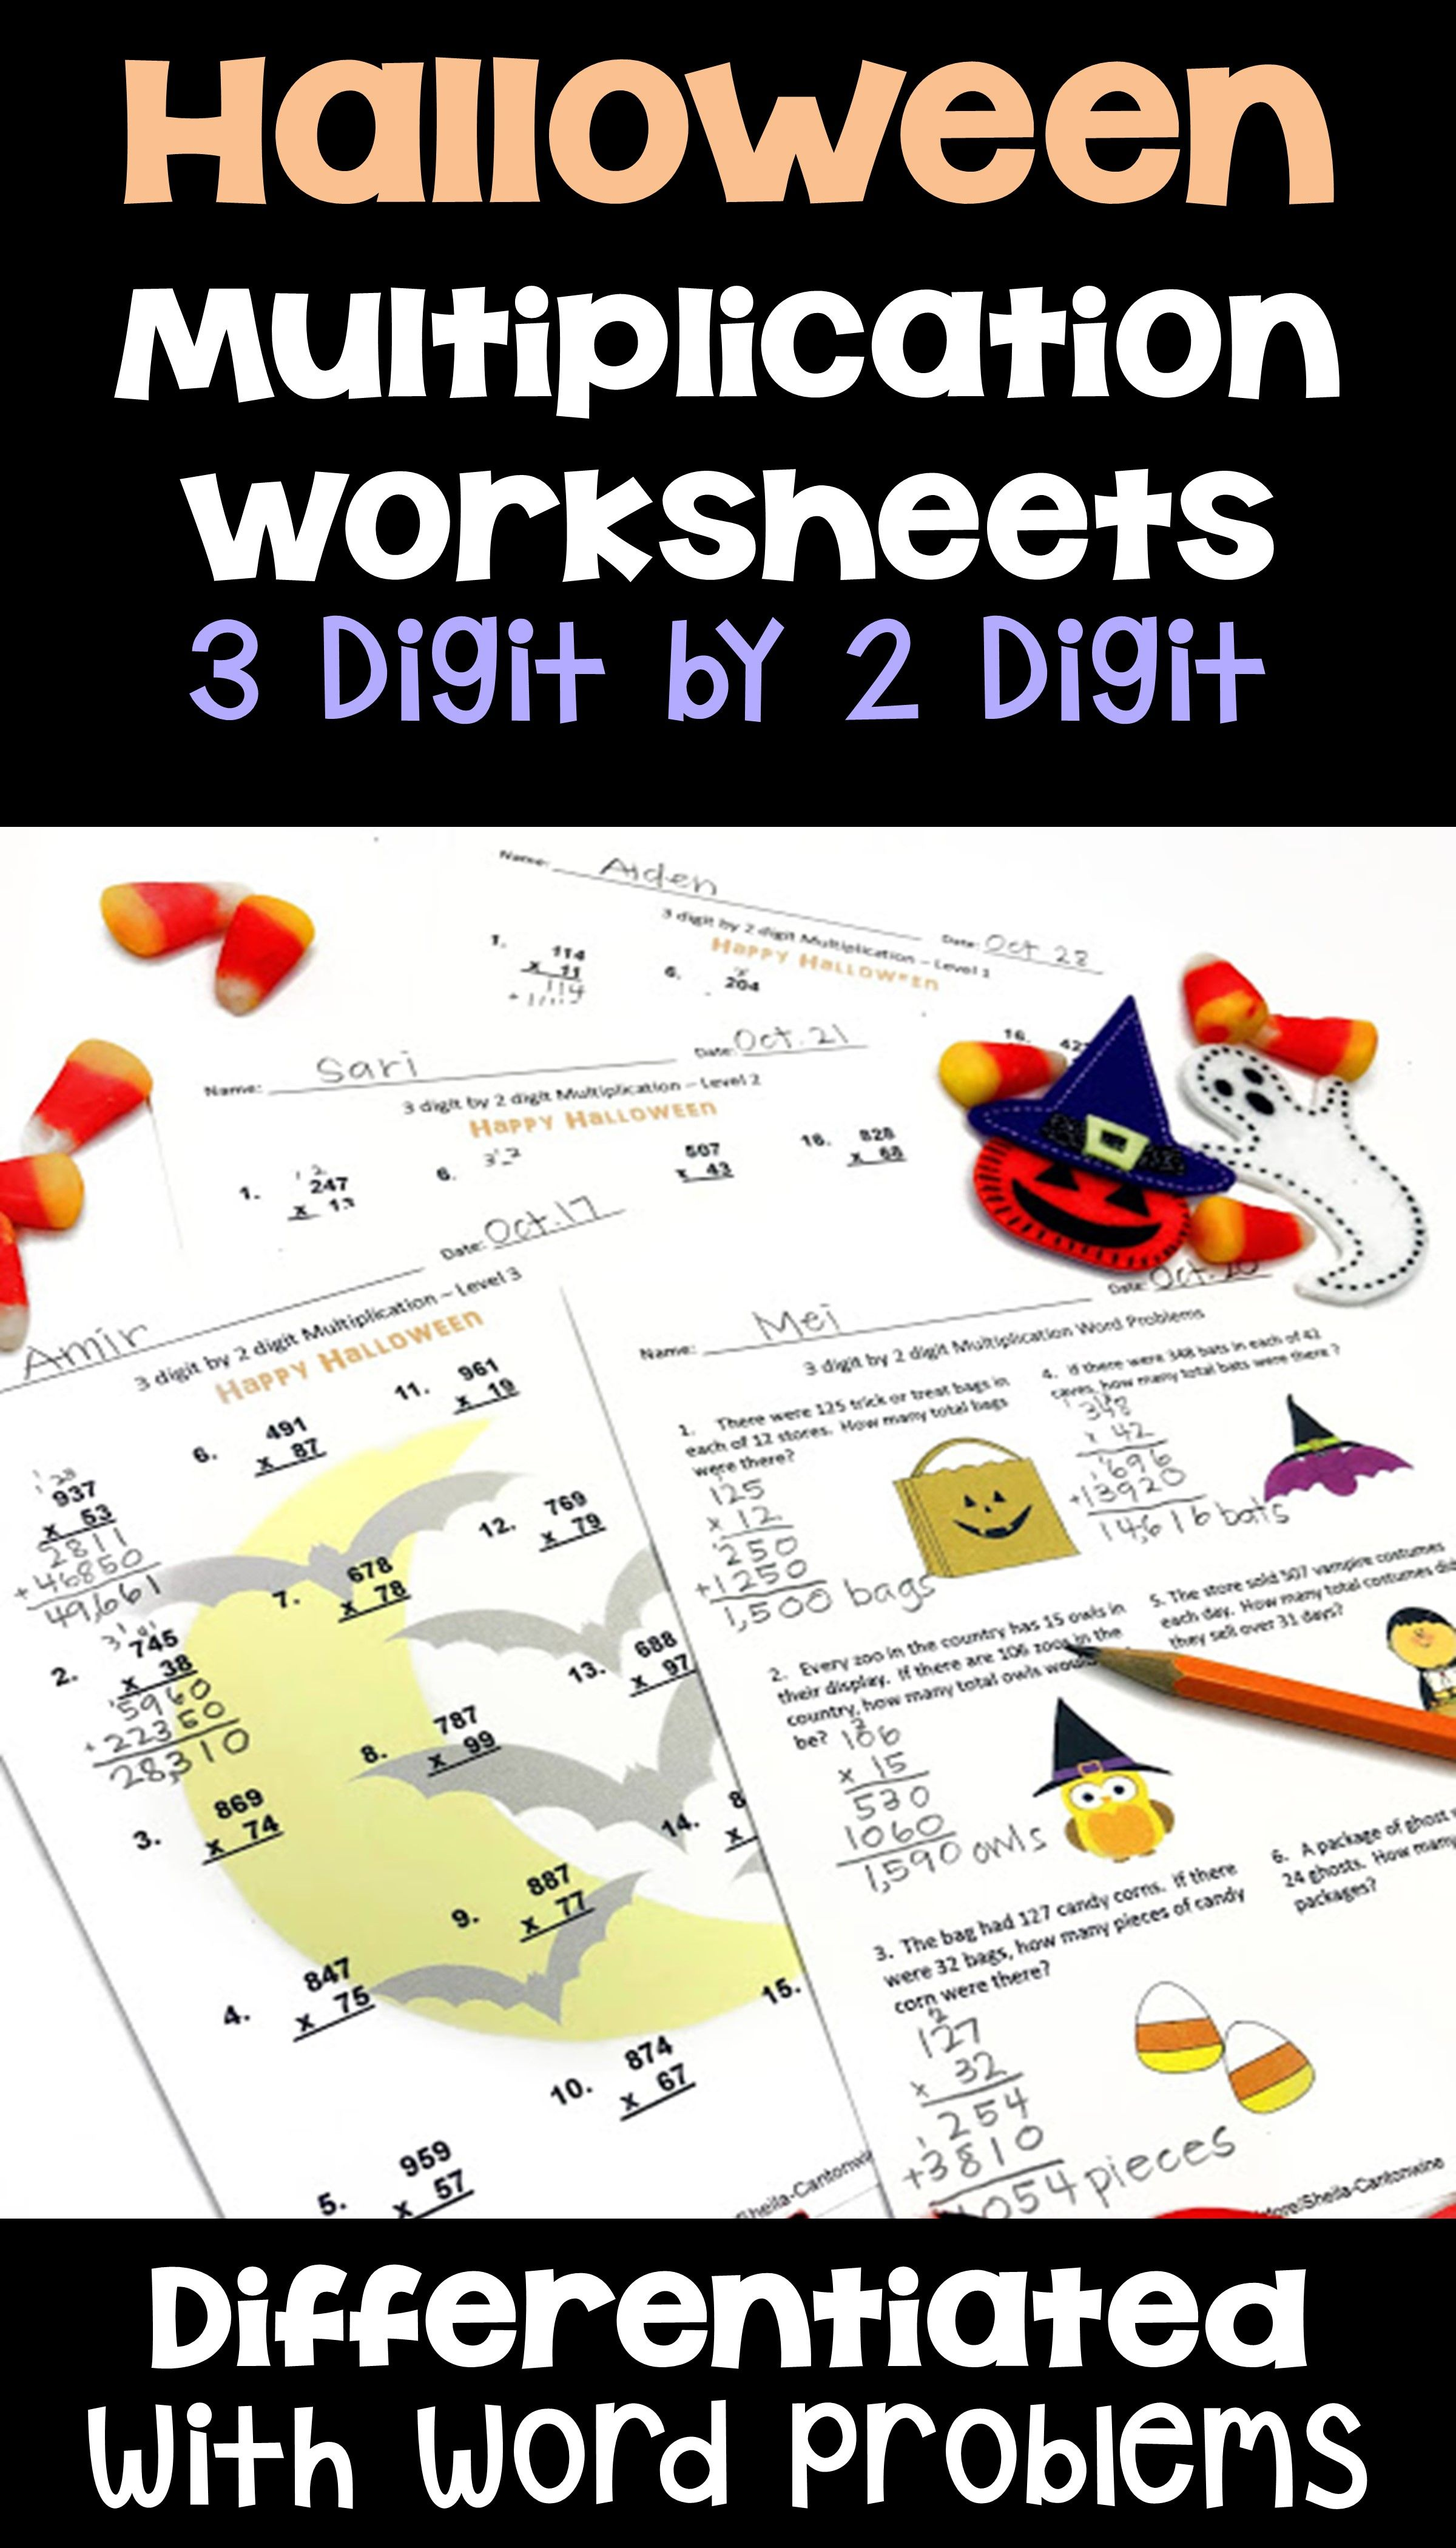 Halloween Math 3 Digit By 2 Digit Multiplication